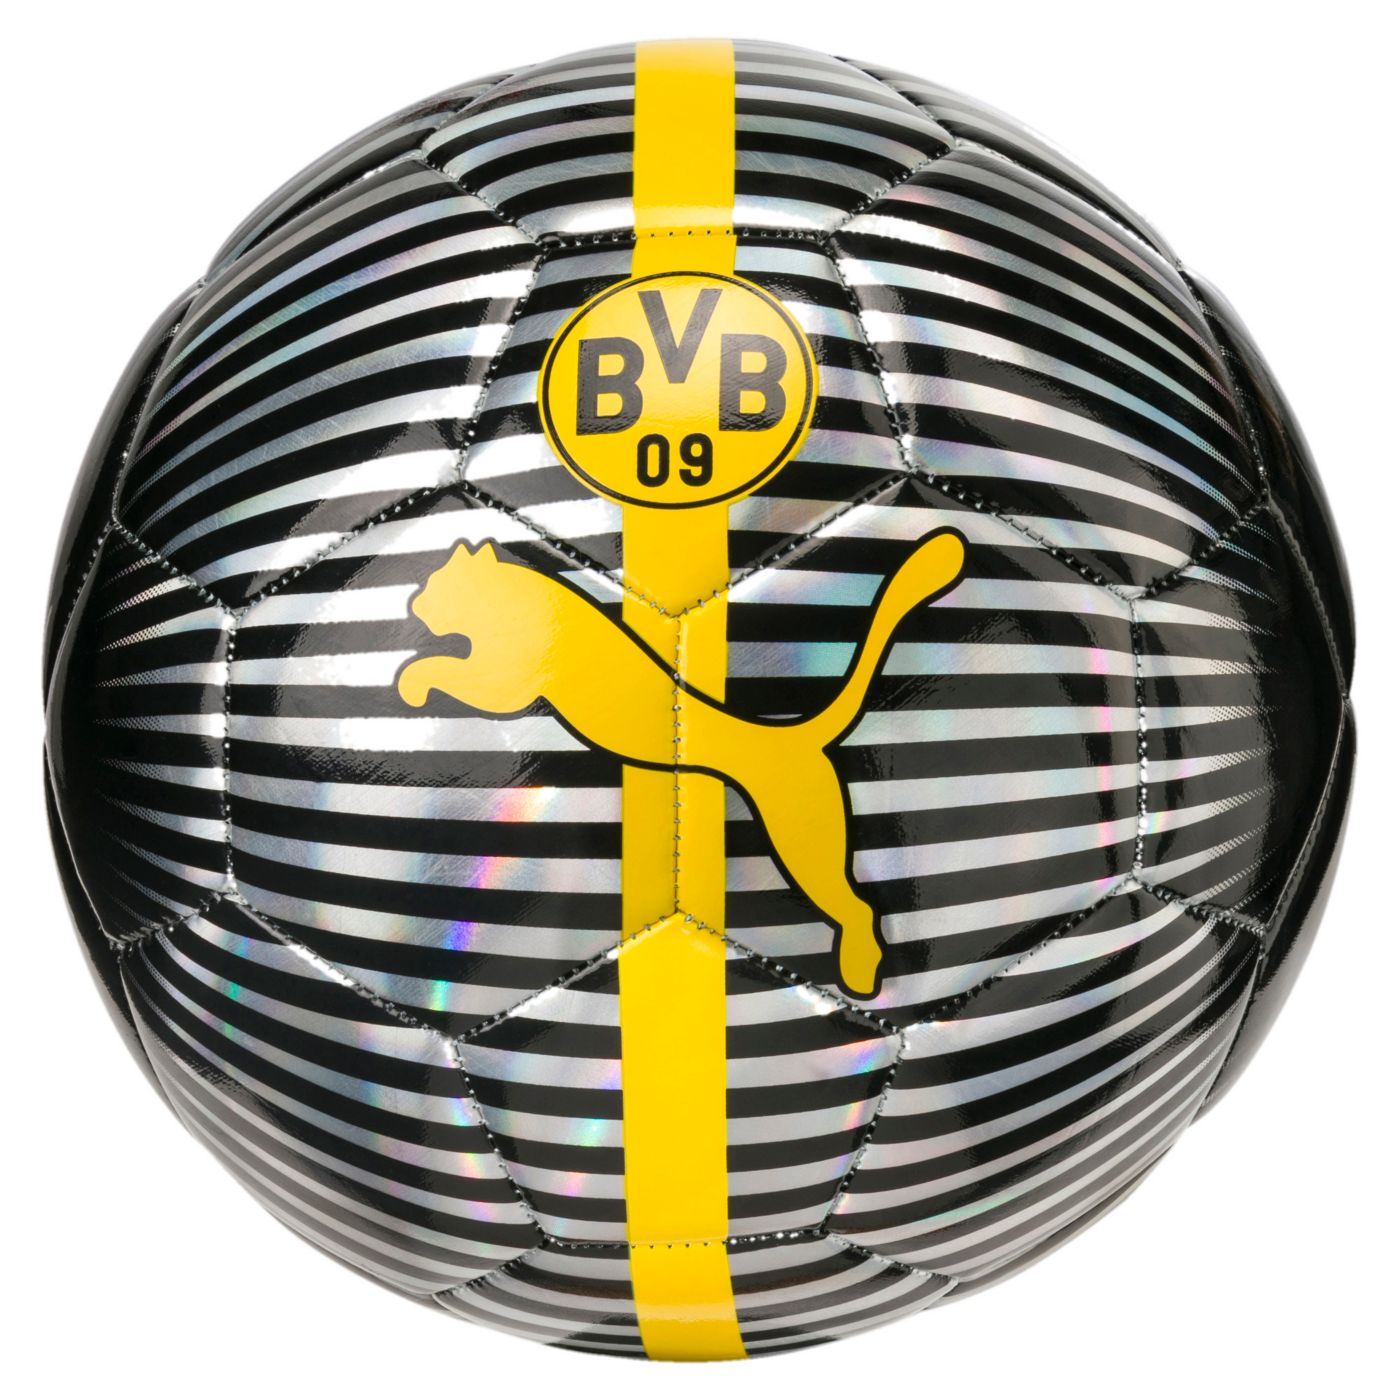 PUMA BVB One Chrome Soccer Ball